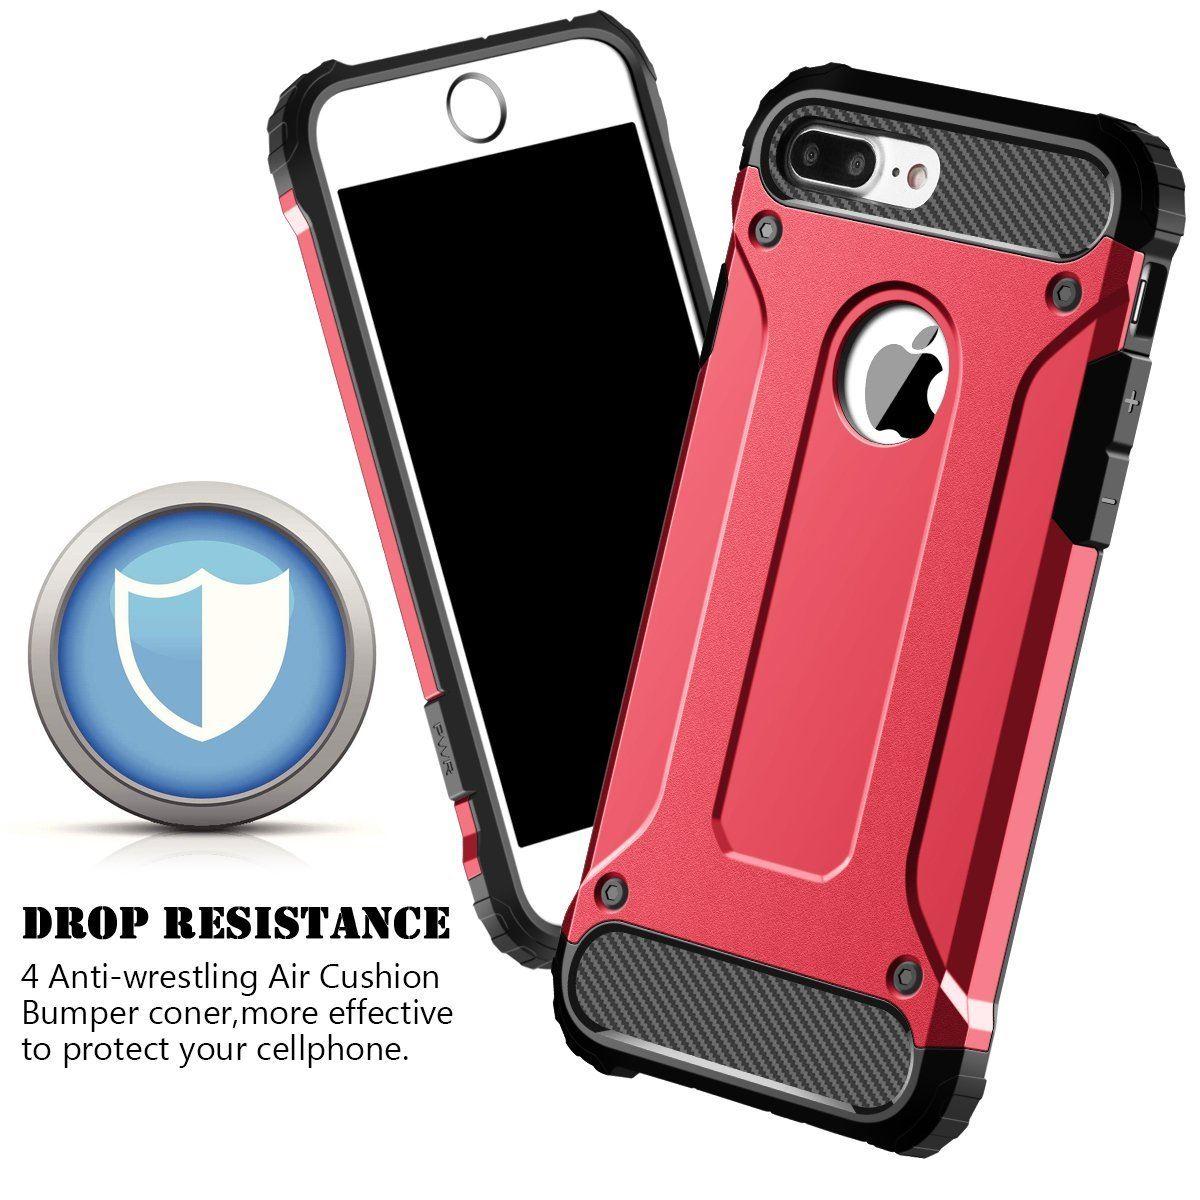 thumbnail 48 - For Apple iPhone 11 Pro Max XR Xs X 8 7 Plus 6 5 Se Case Cover Tough Armor